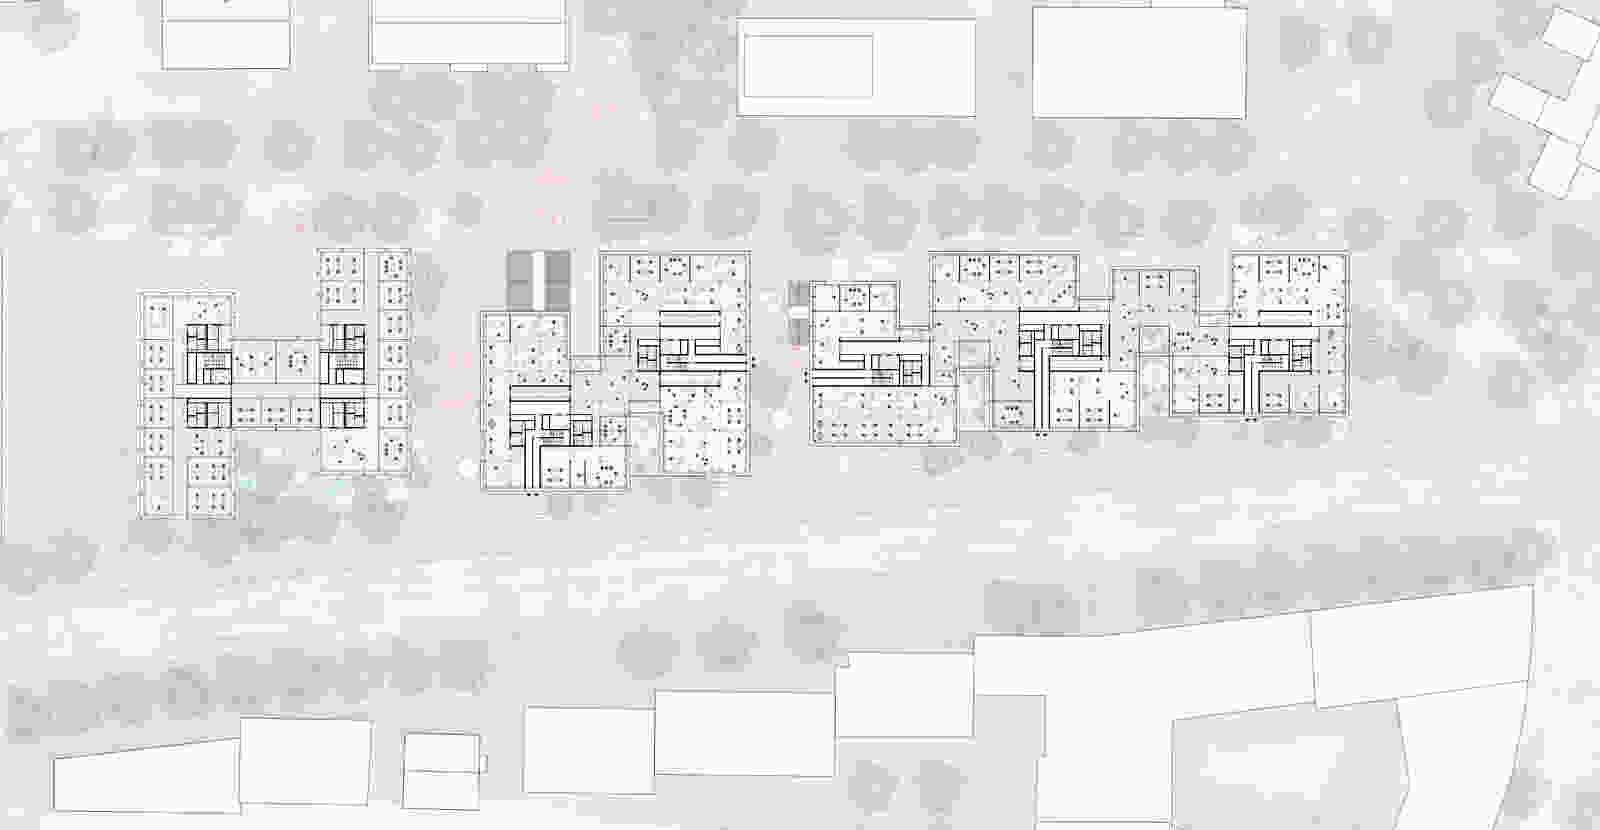 491 dmaa Gasstrasse plan level 01